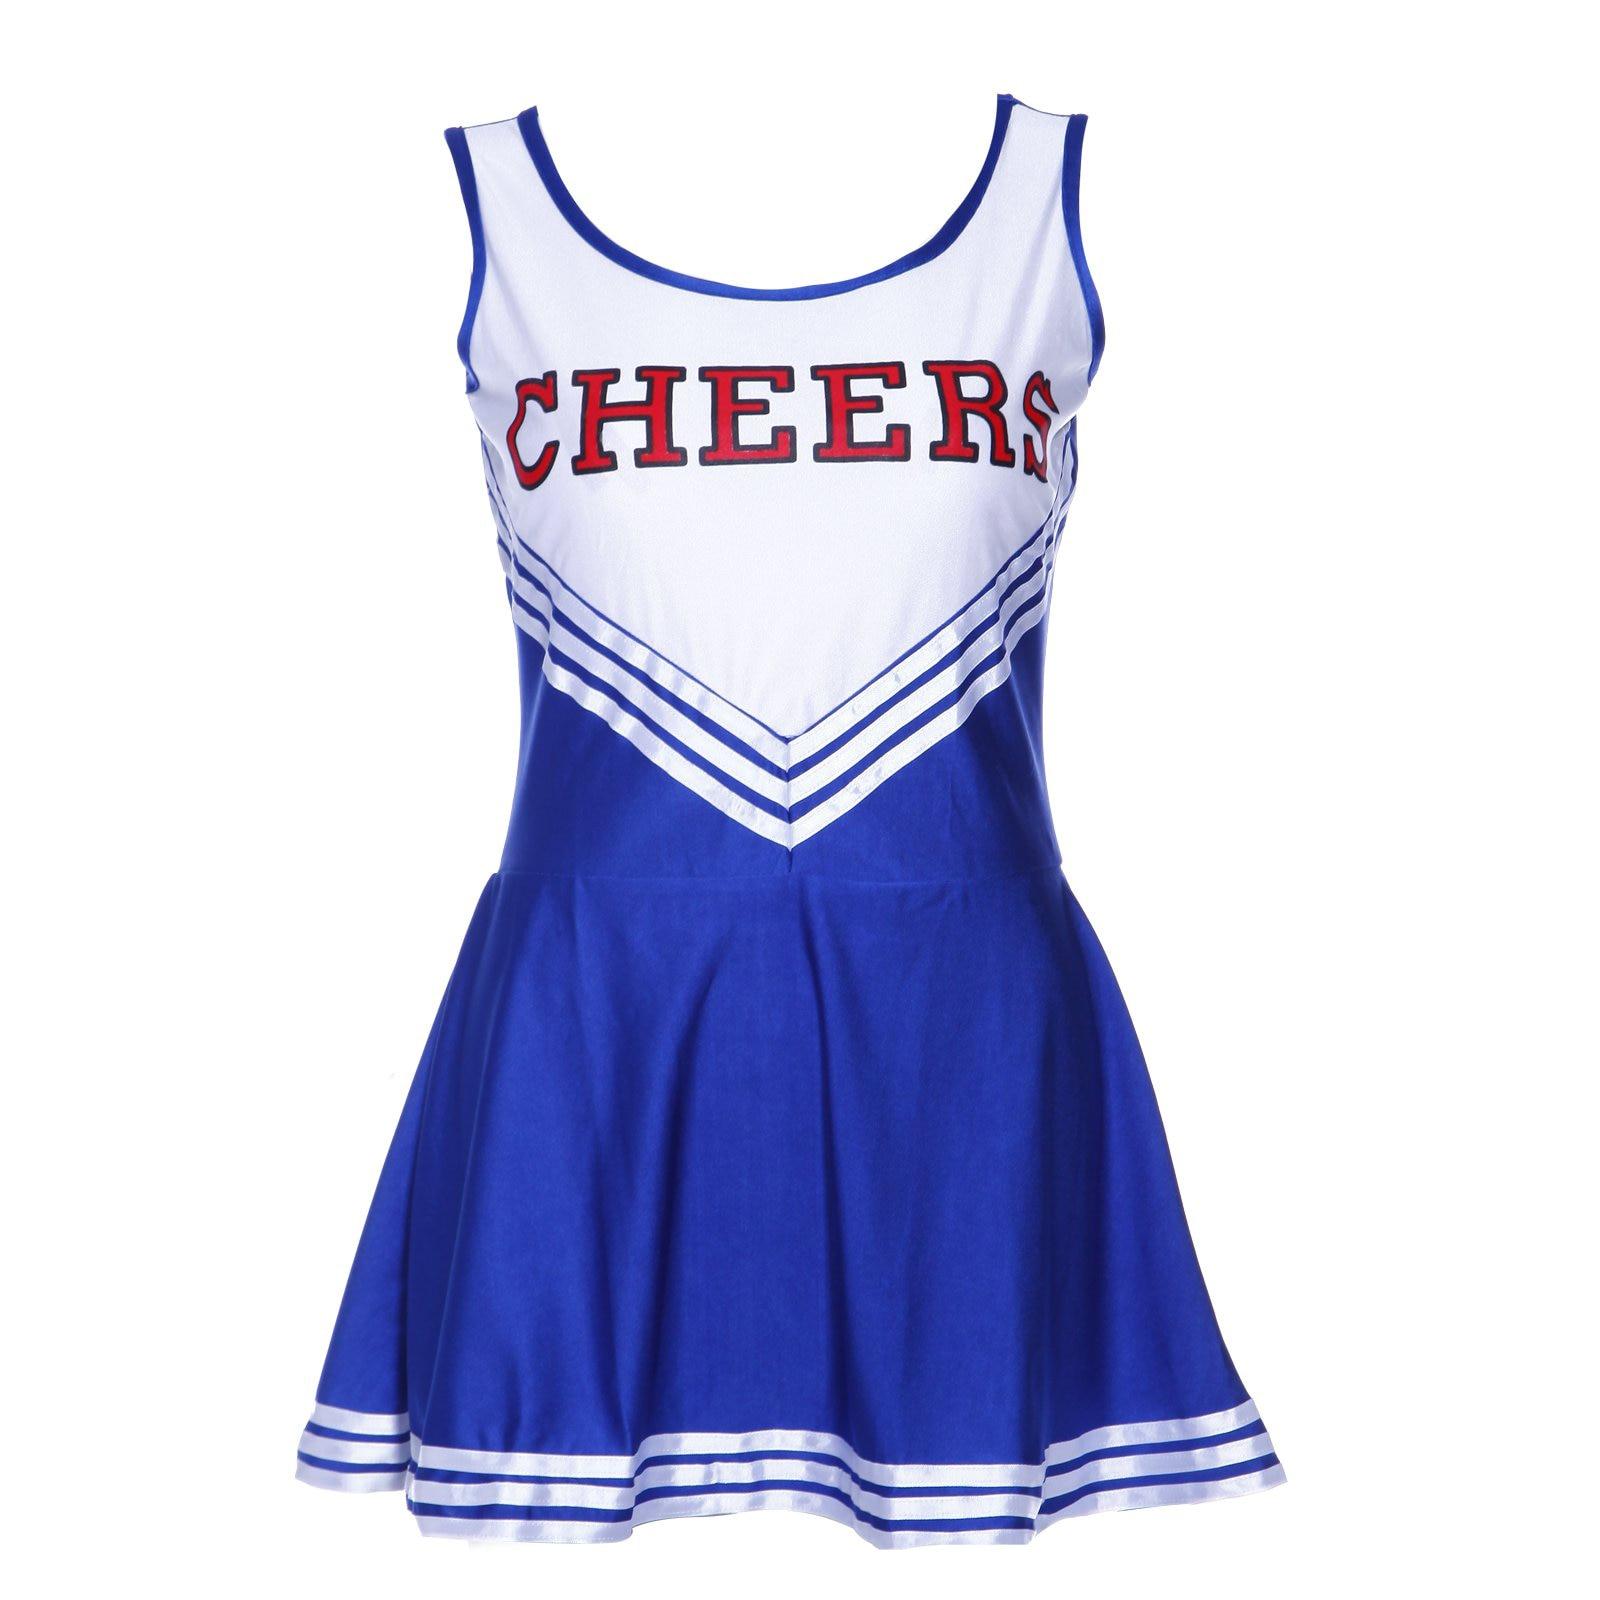 5 PCS JHO Tank Dress Blue fancy dress cheerleader pom pom girl party girl XS 14